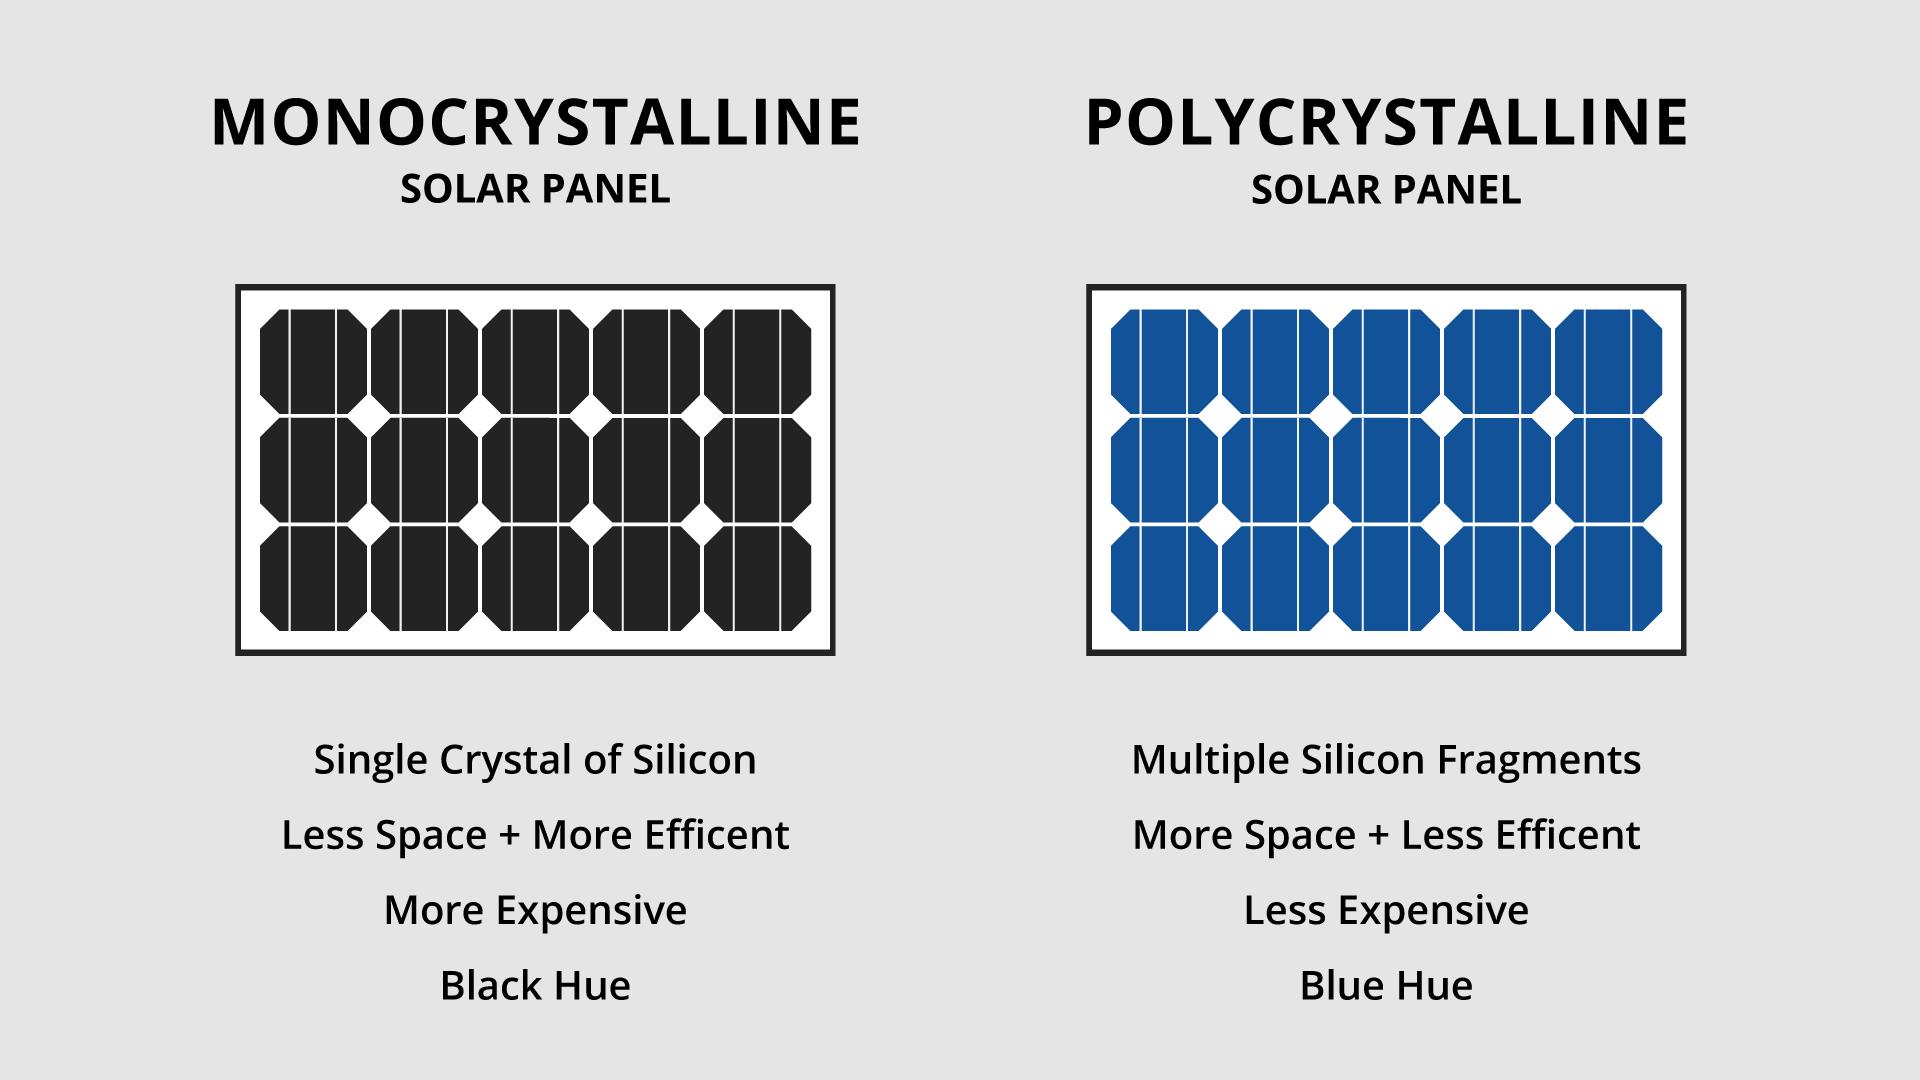 Monocrystalline solar panel and a polycrystalline panel